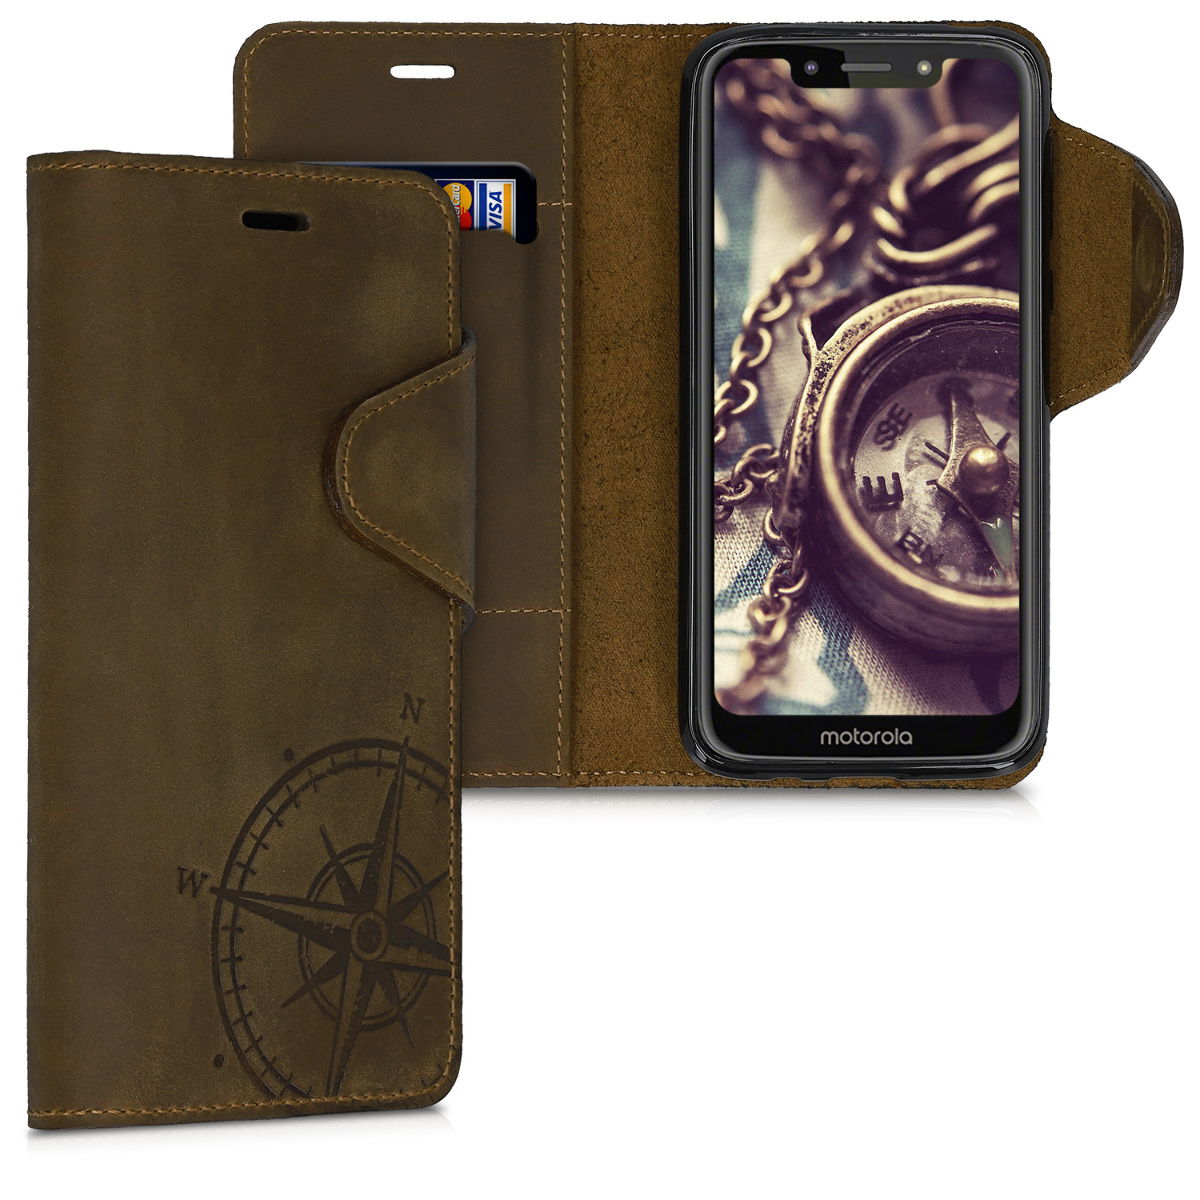 Kalibri Δερμάτινη Suede Θήκη - Πορτοφόλι Motorola Moto G7 Play - Brown (50601.01)